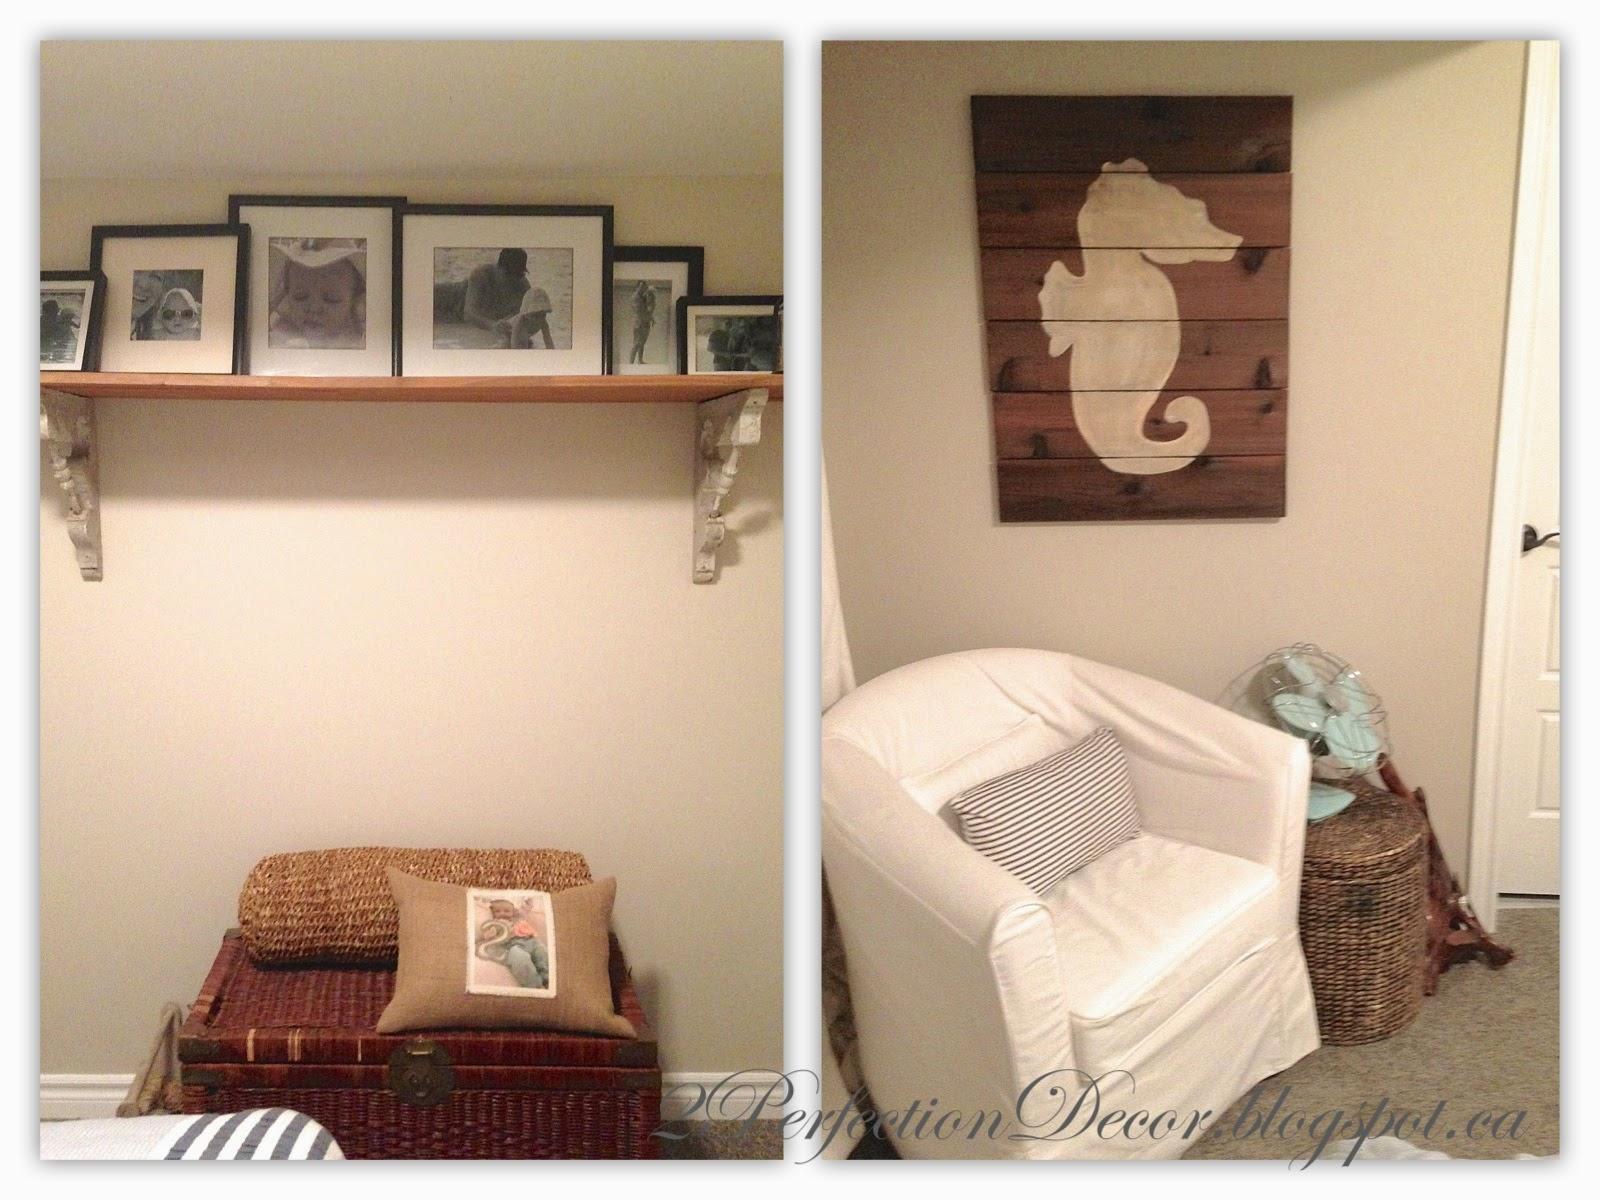 2perfection Decor Basement Coastal Bathroom Reveal: 2Perfection Decor: Our Basement Guest Bedroom Reveal